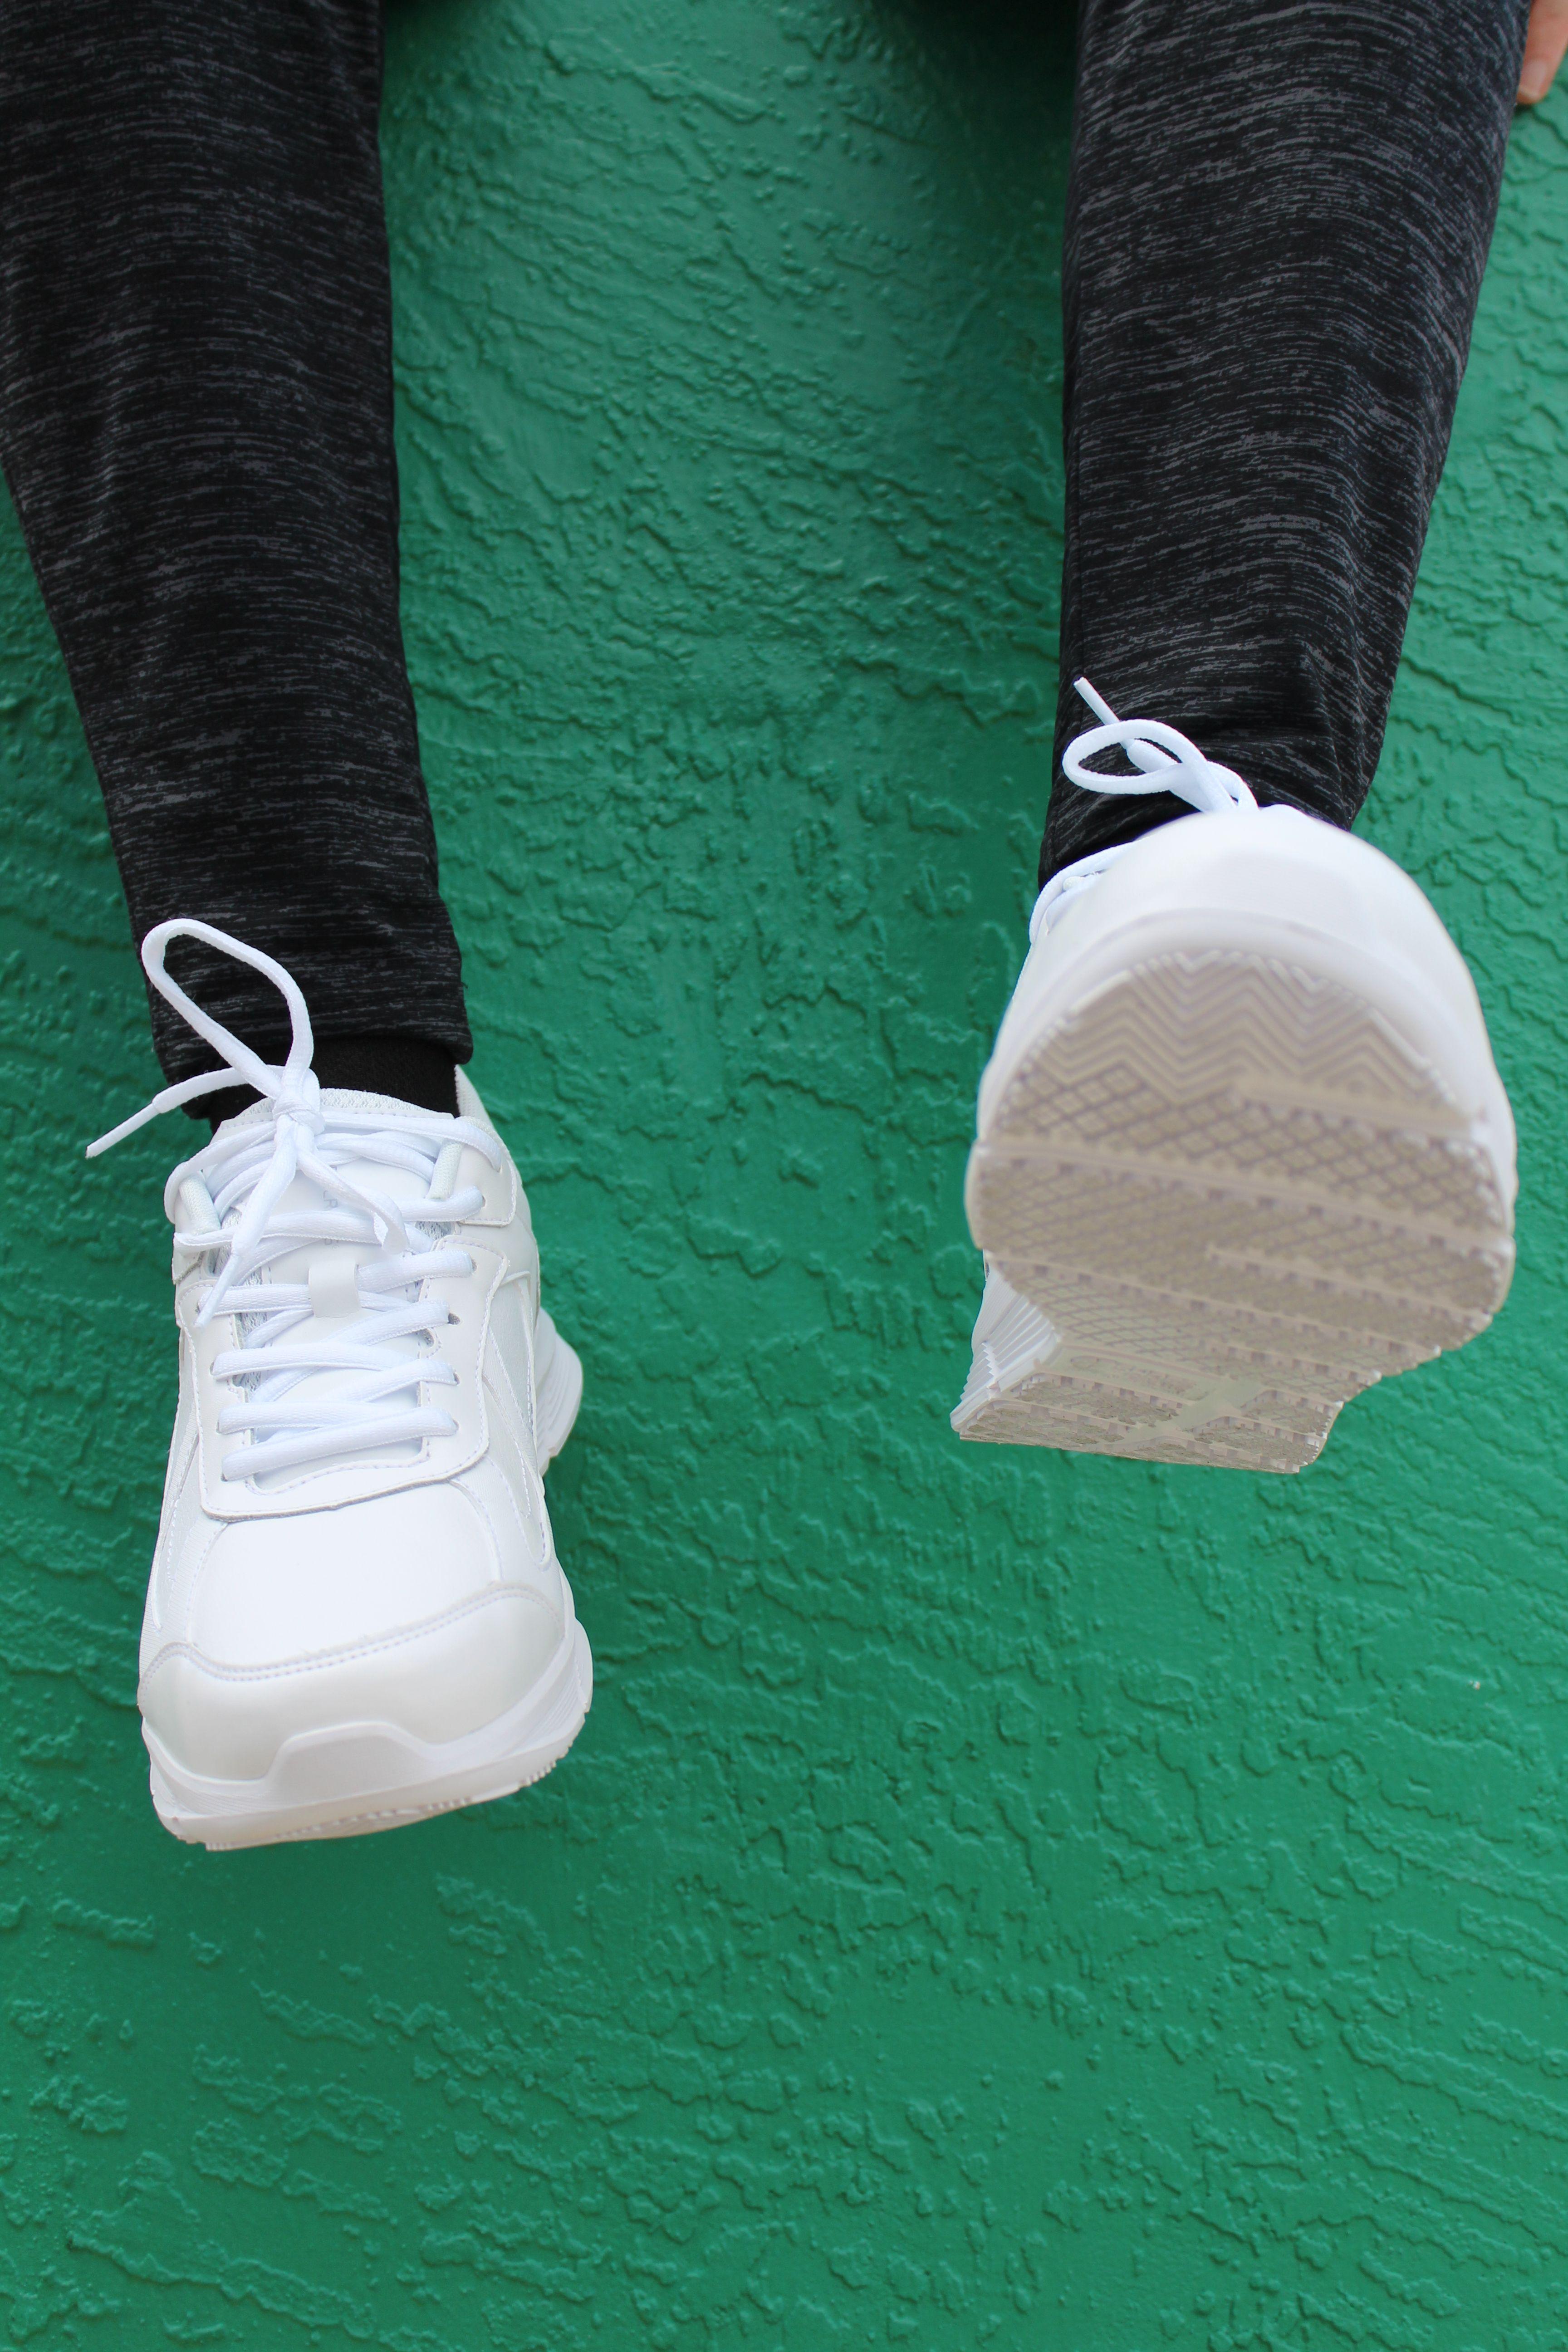 ZOVE Walking Shoes Women Comfor Work Slip On Tennis Travel Sneakers Lightweight